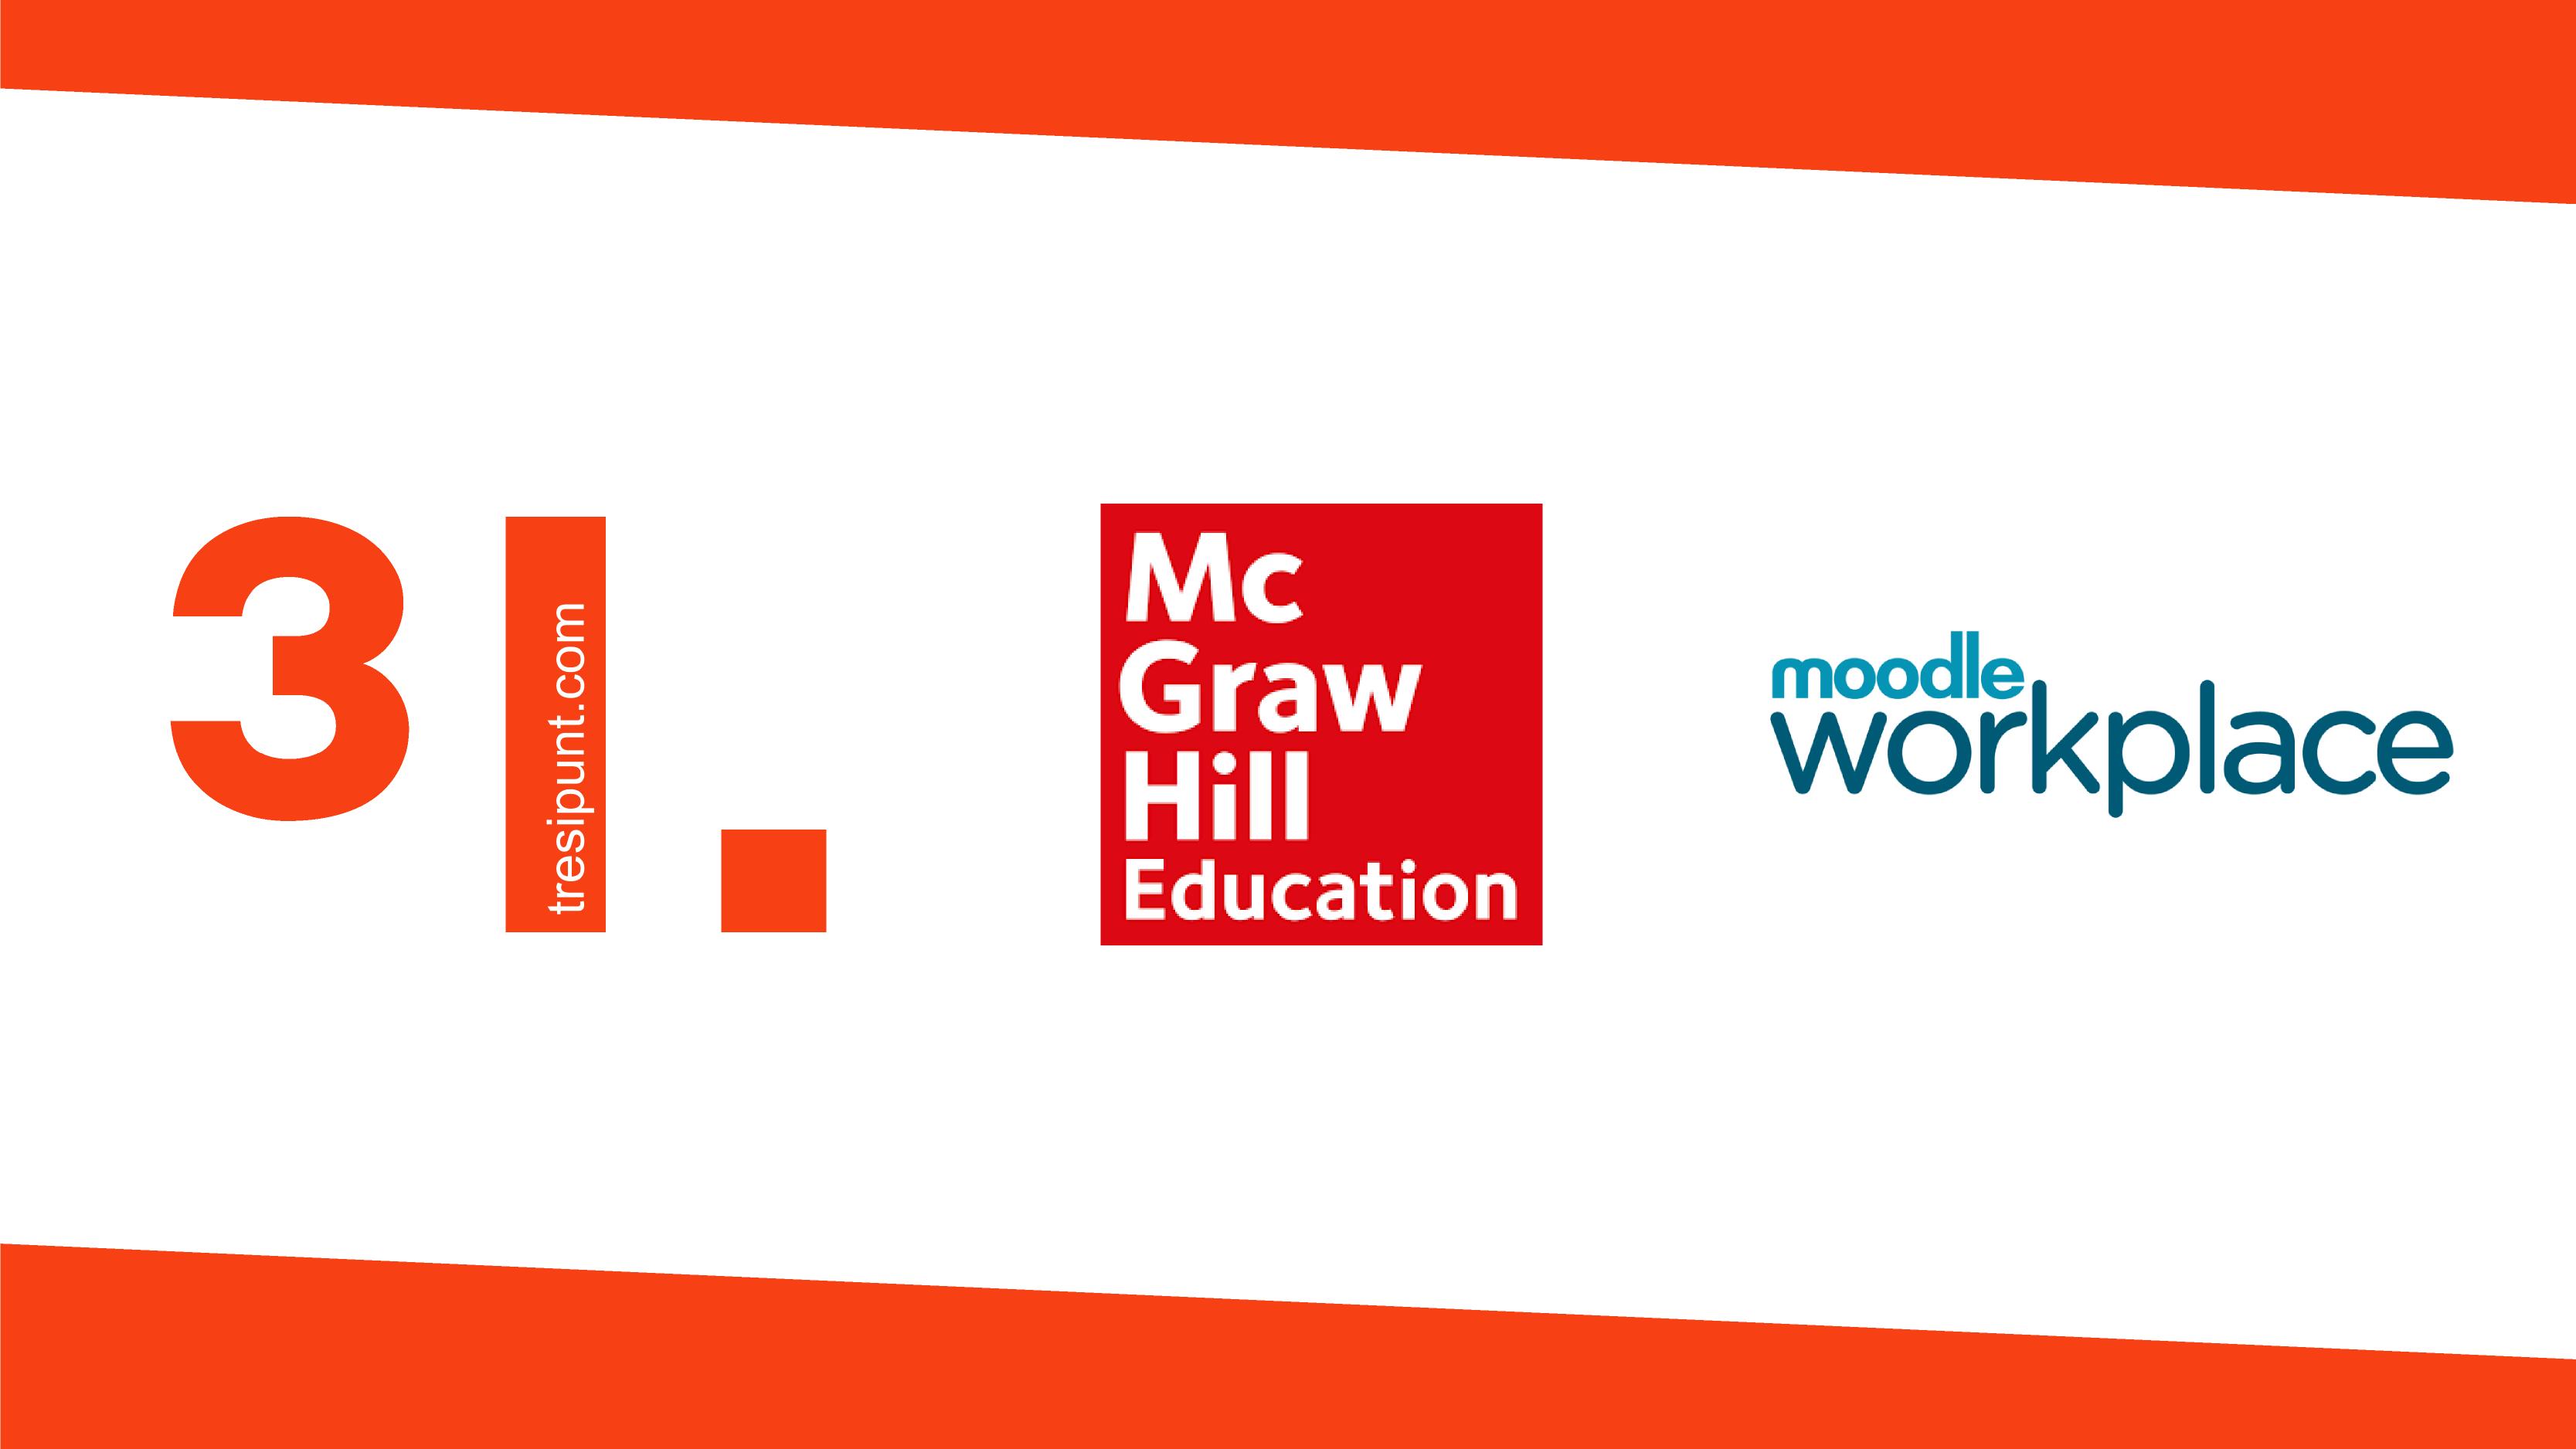 3ip_mcgraw_moodleworkplace_logos-01.png